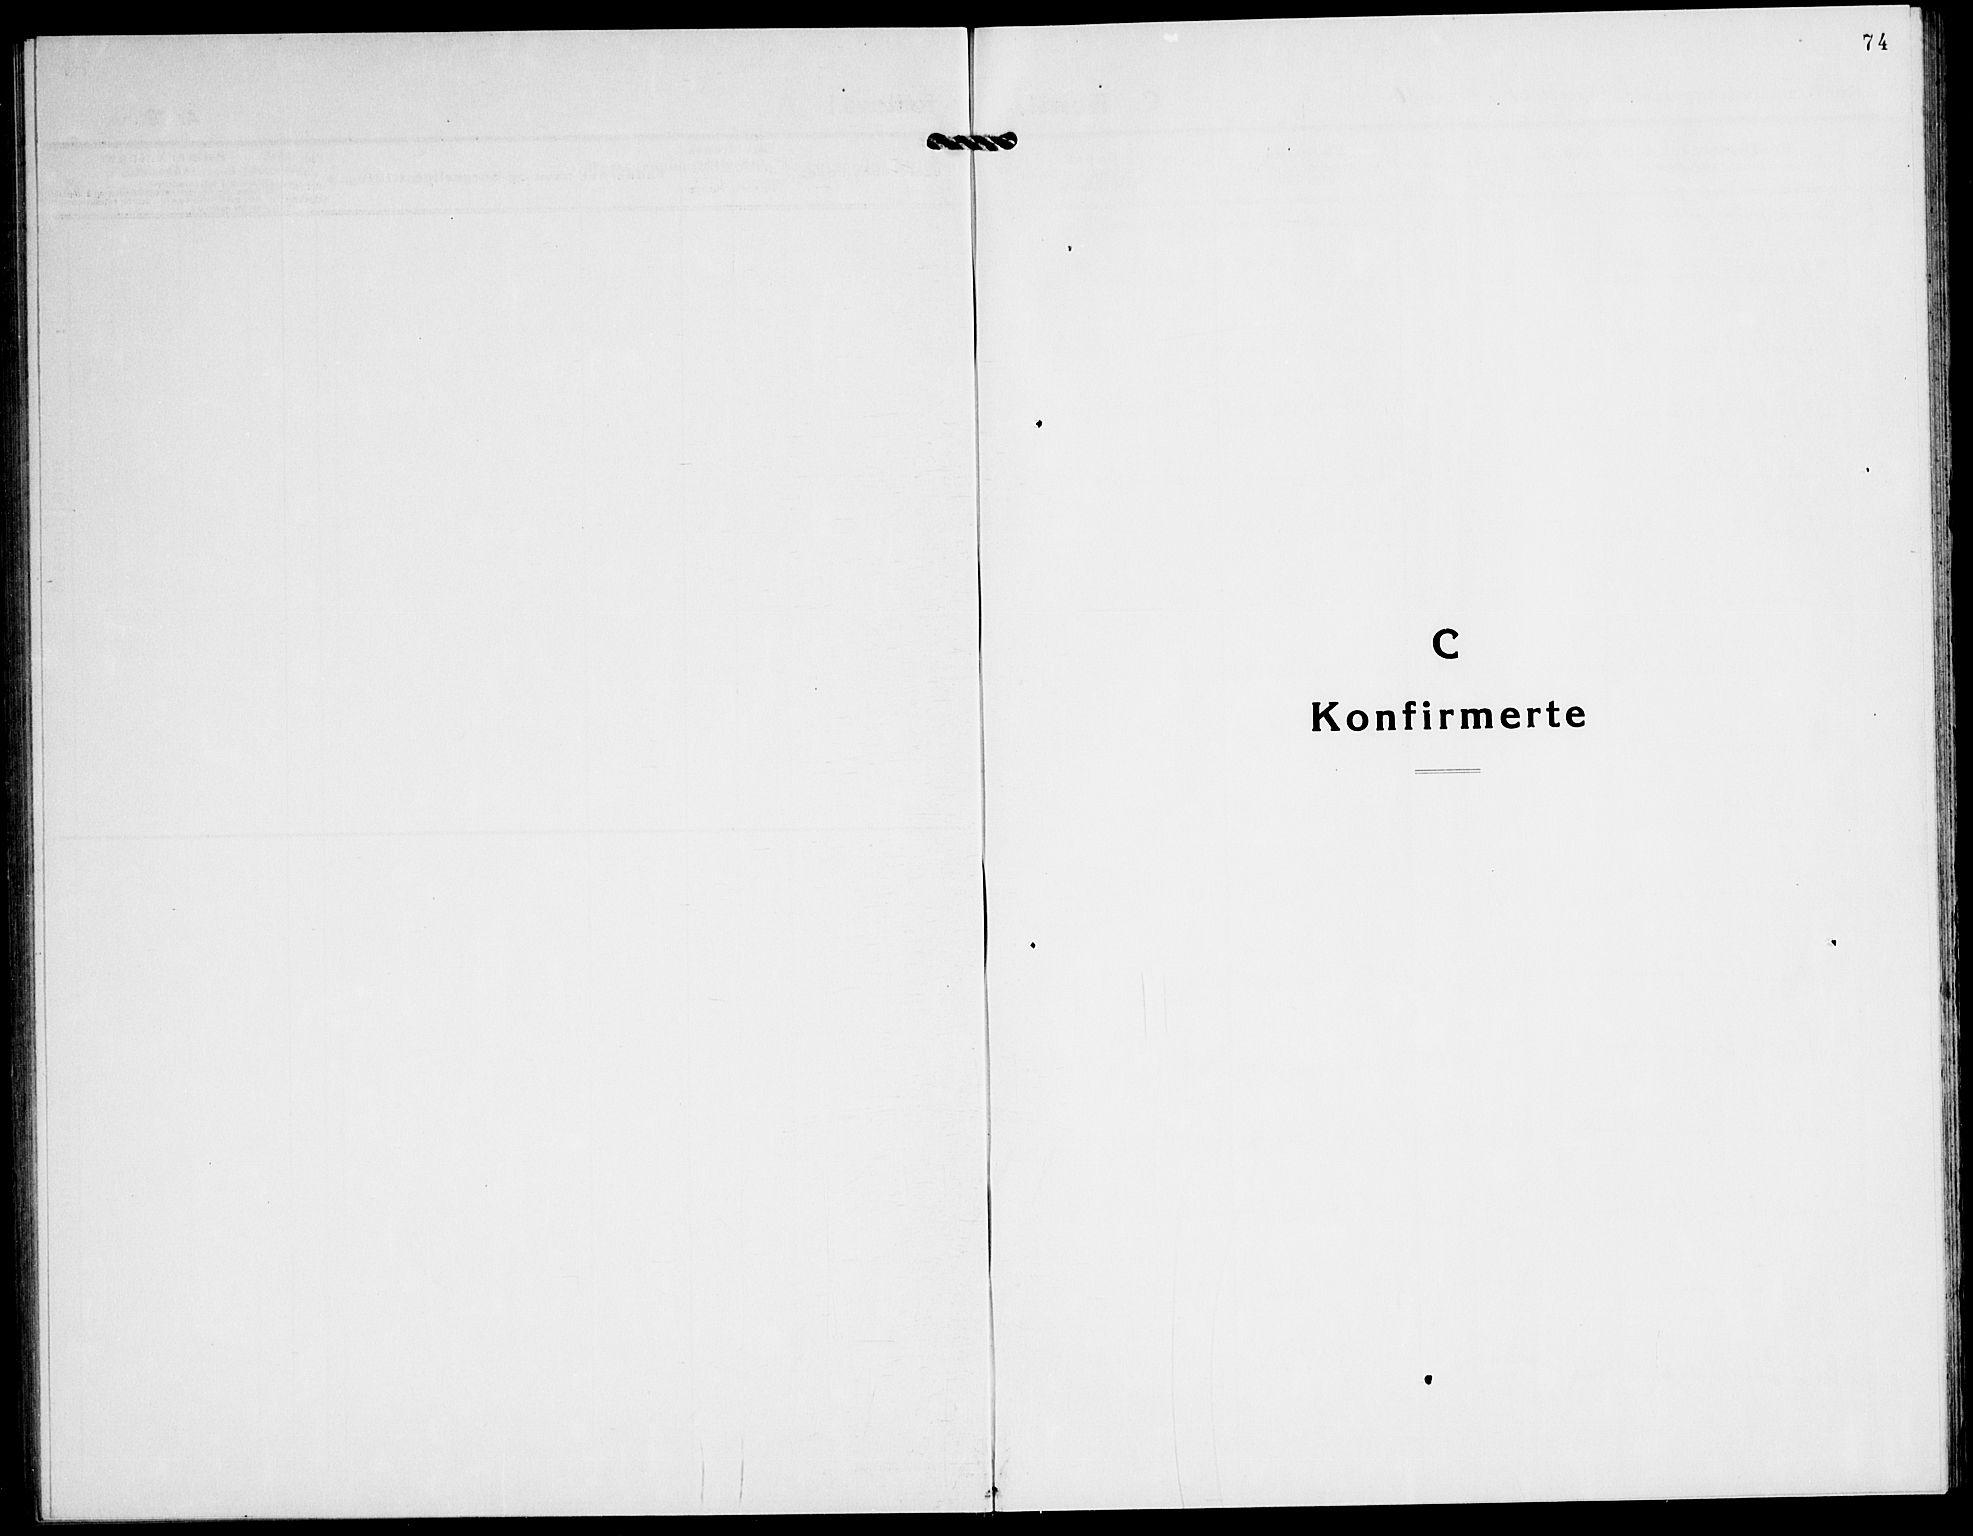 SATØ, Tranøy sokneprestkontor, I/Ia/Iab/L0016klokker: Klokkerbok nr. 16, 1930-1945, s. 74